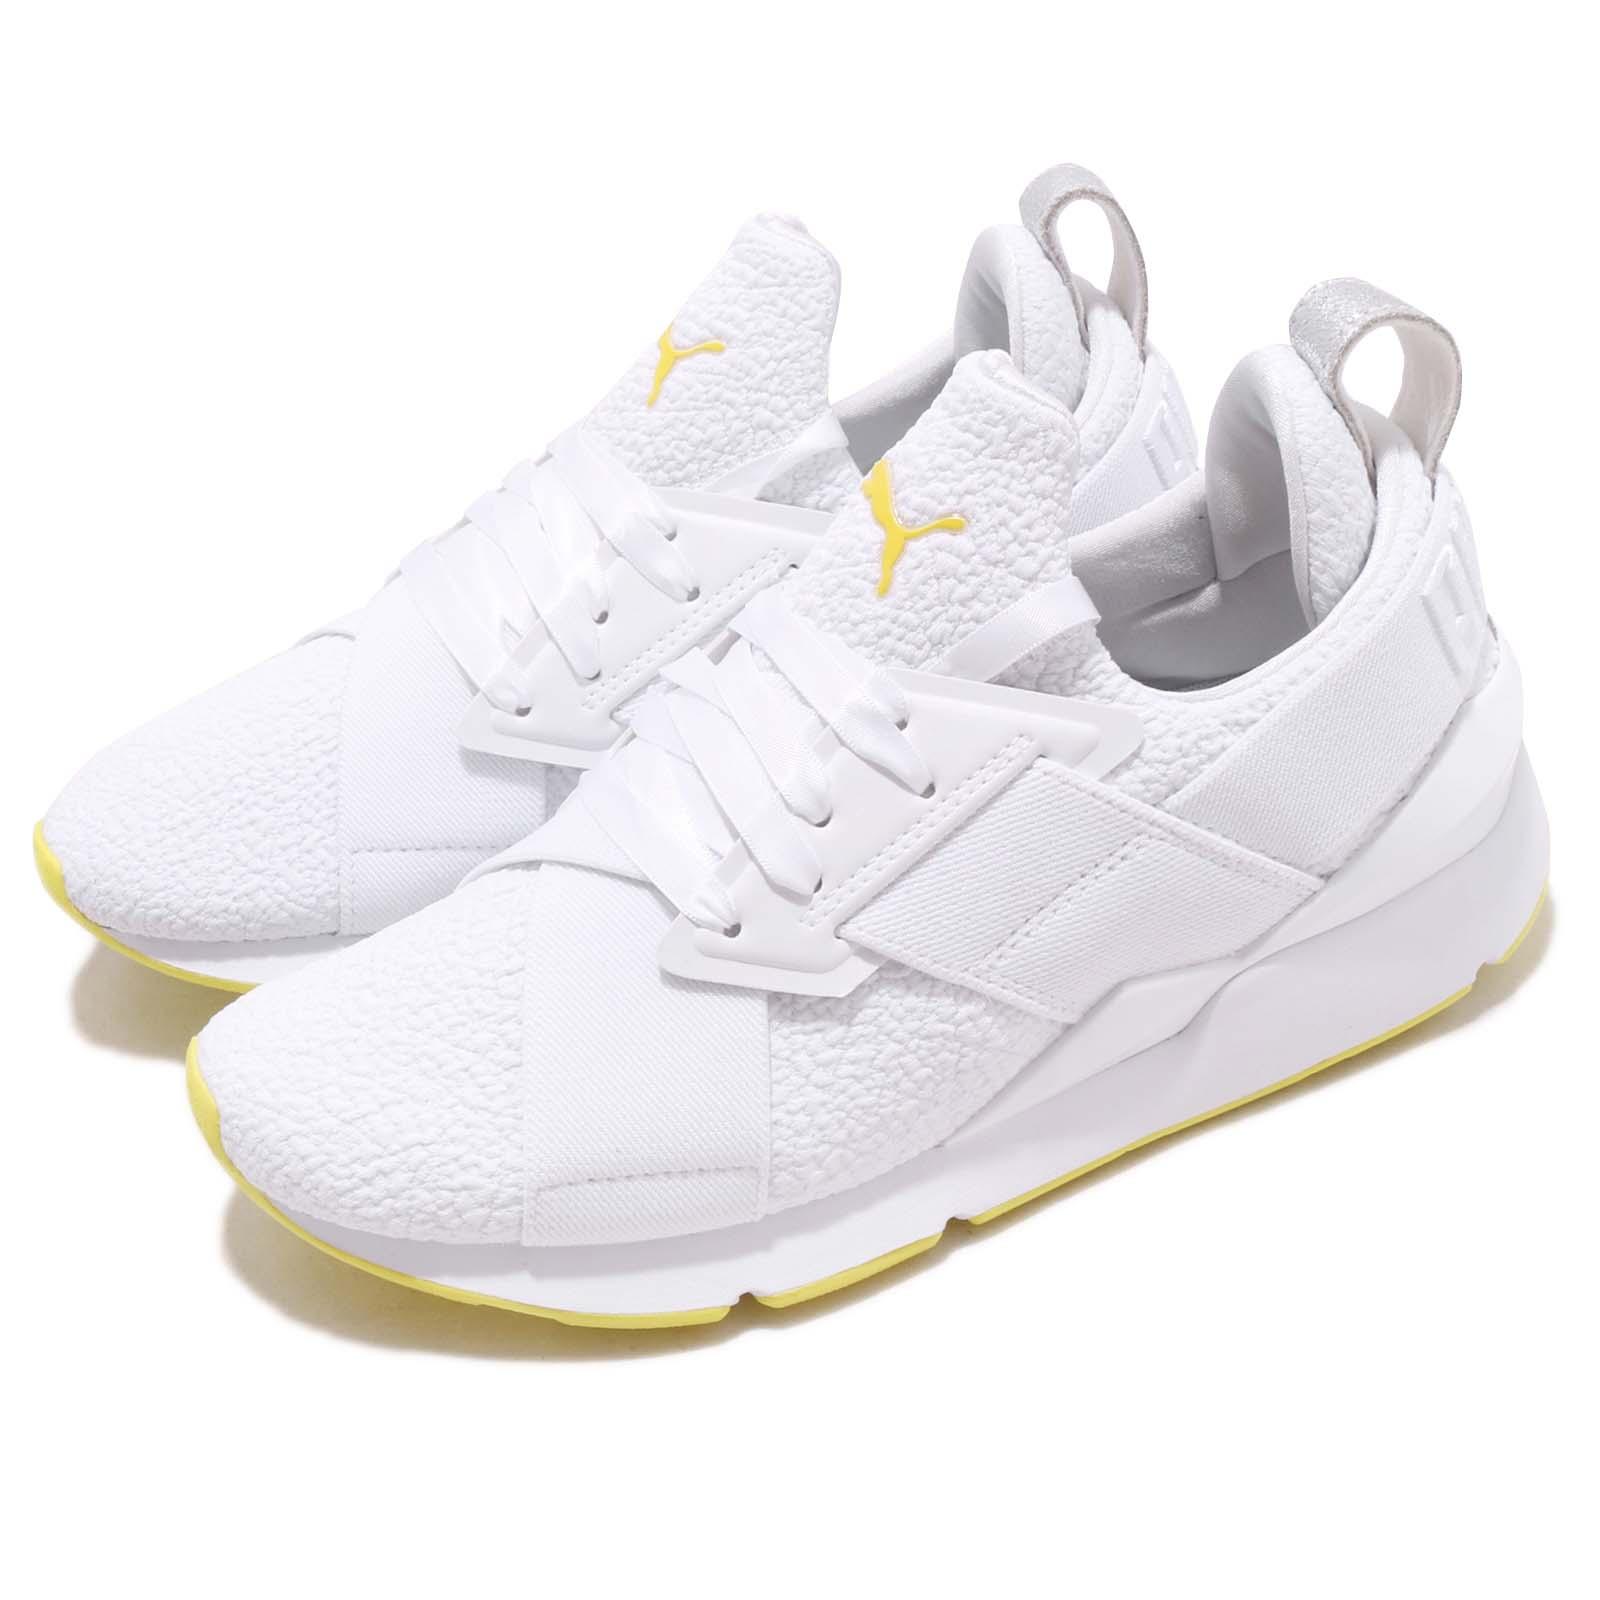 Puma 休閒鞋 Muse TZ Wns 襪套 女鞋 36965801